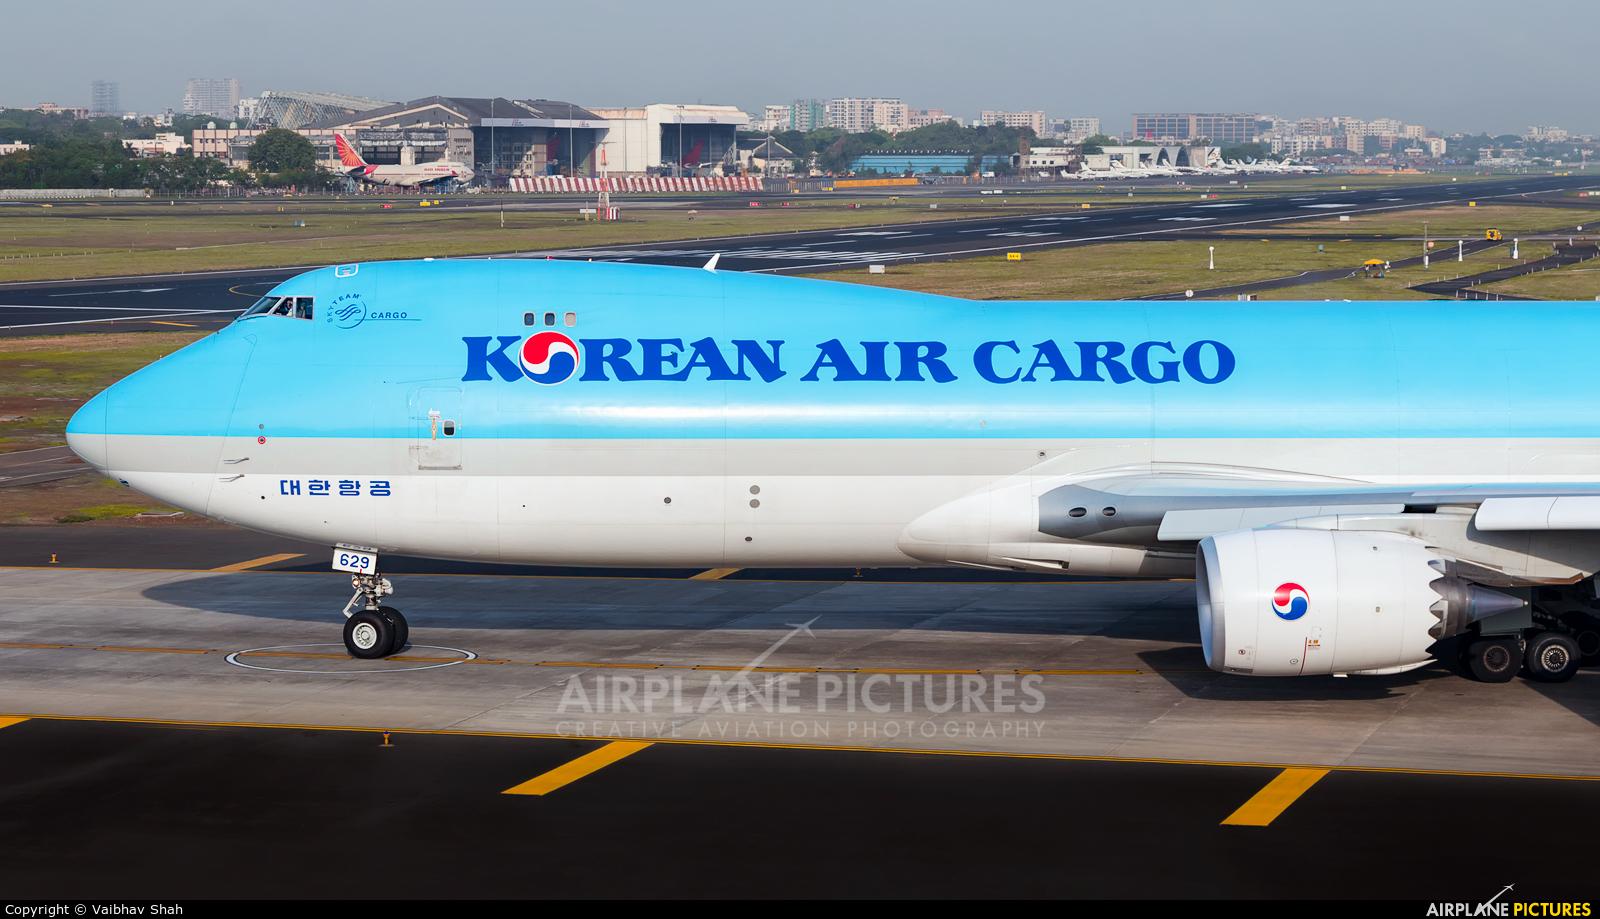 Korean Air Cargo HL7629 aircraft at Mumbai - Chhatrapati Shivaji Intl